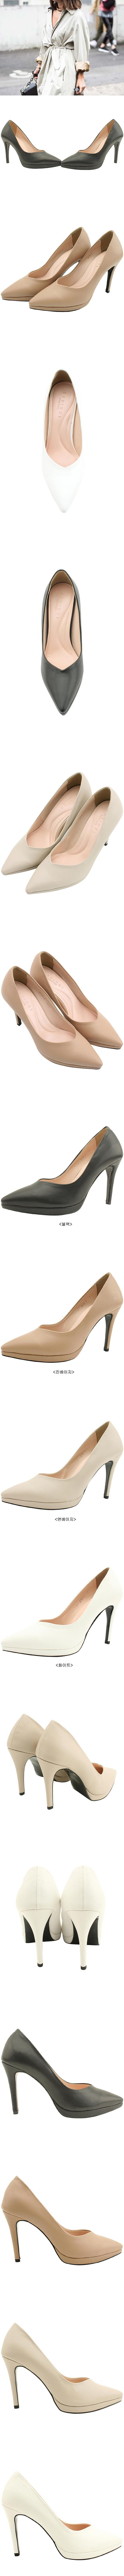 Gabosi Stiletto High Heels 10cm White